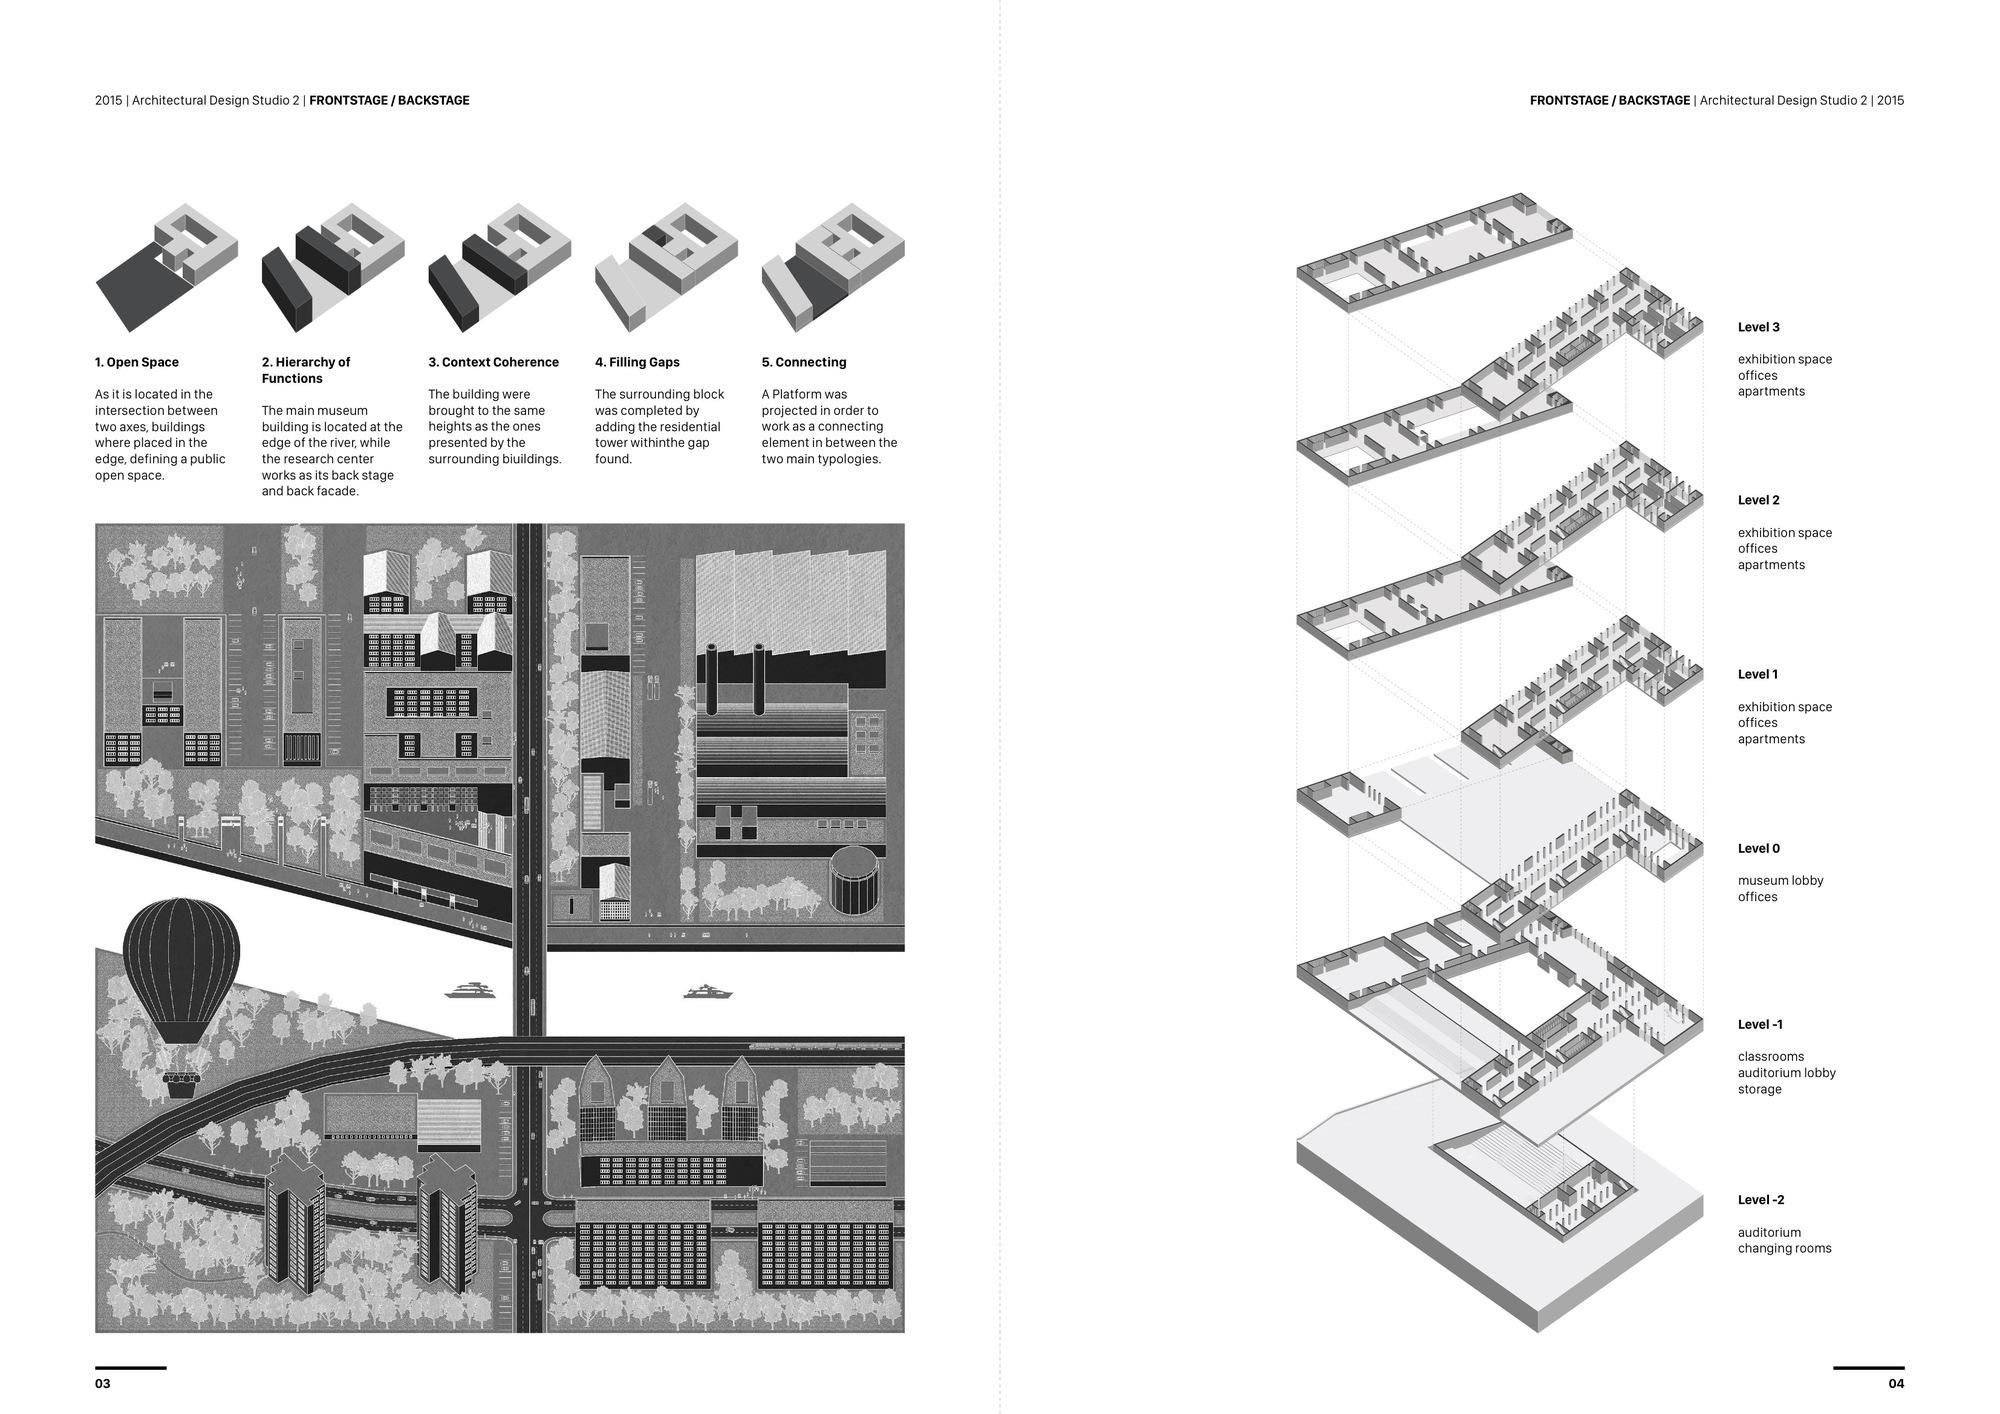 Gallery of the best architecture portfolio designs 38 for Architectural portfolio ideas